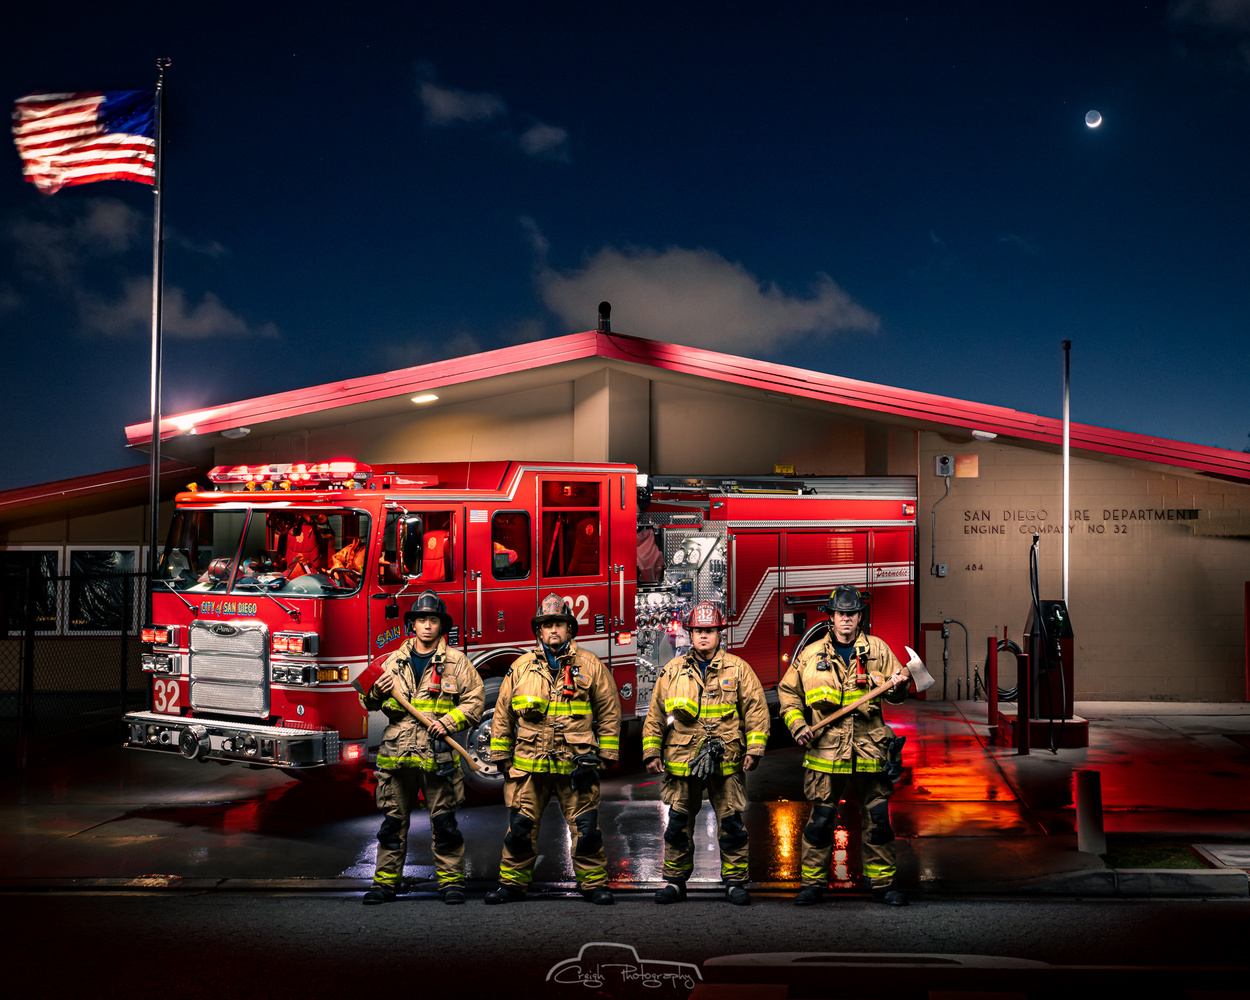 Engine 32 / San Diego Fire Dept. by Creigh McIntyre